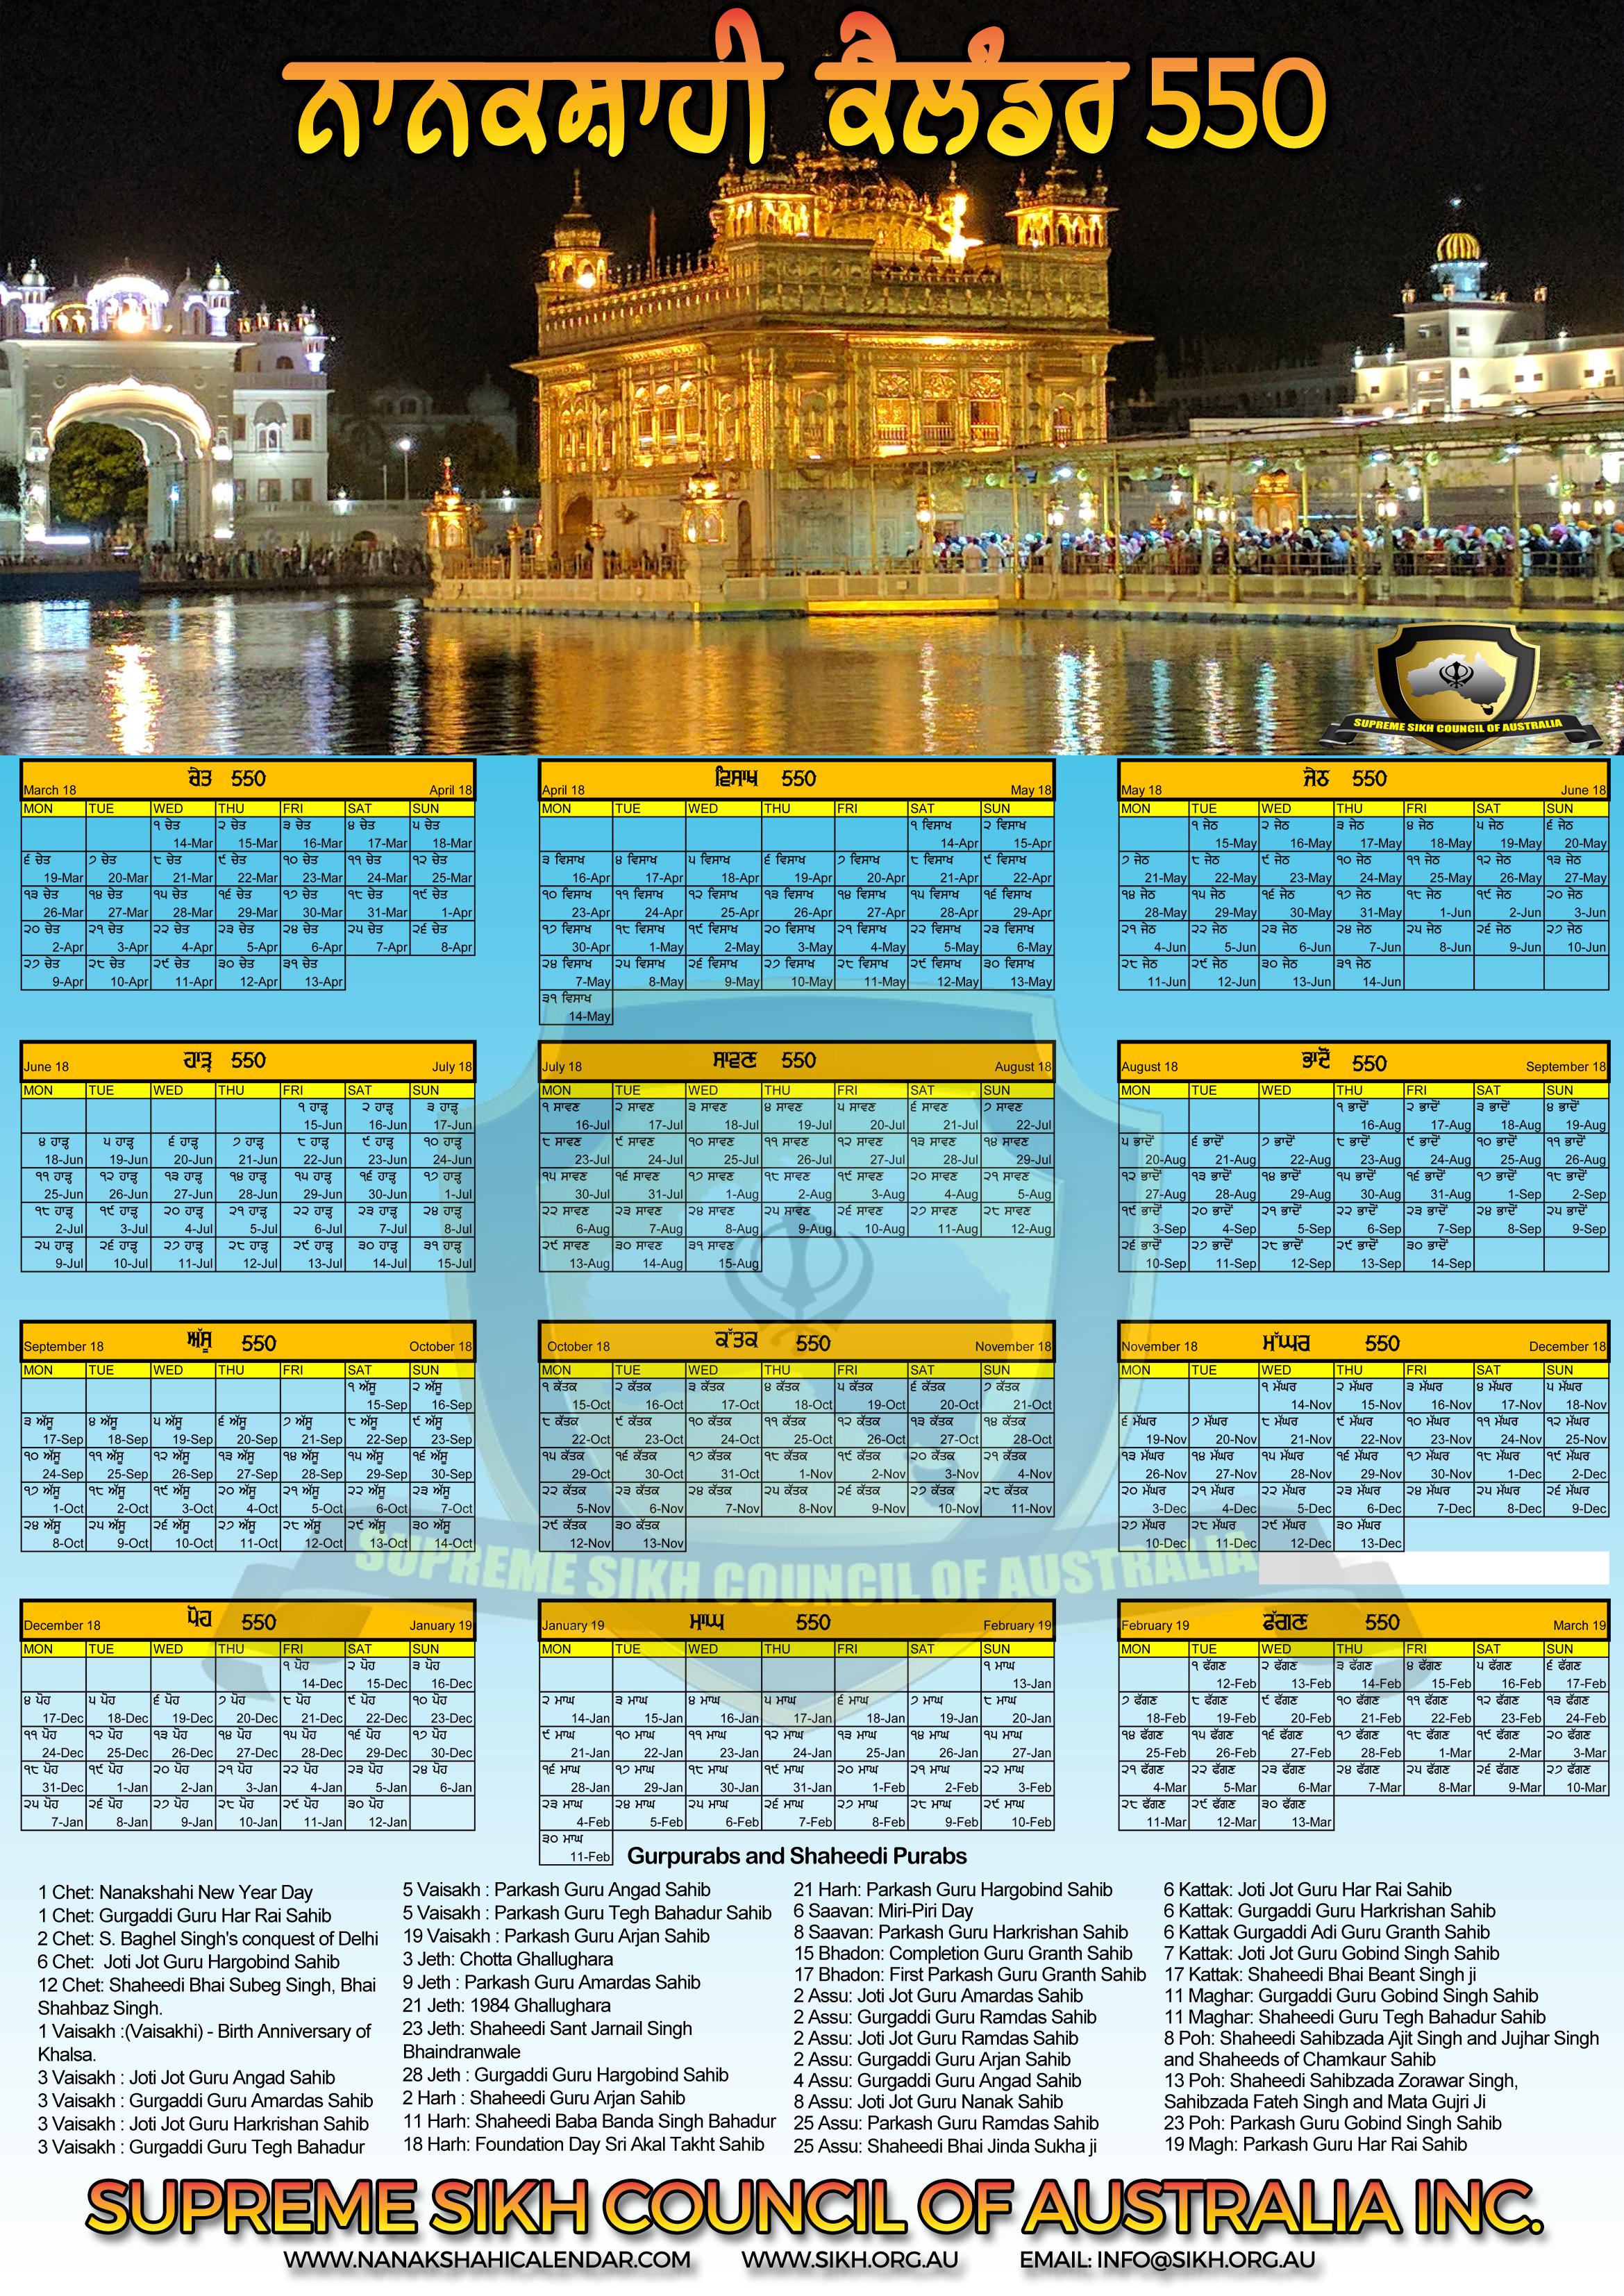 Nanakshahi Calendar | ਮੂਲ ਨਾਨਕਸ਼ਾਹੀ ਕੈਲੰਡਰ inside Sgpc Calendar 2020